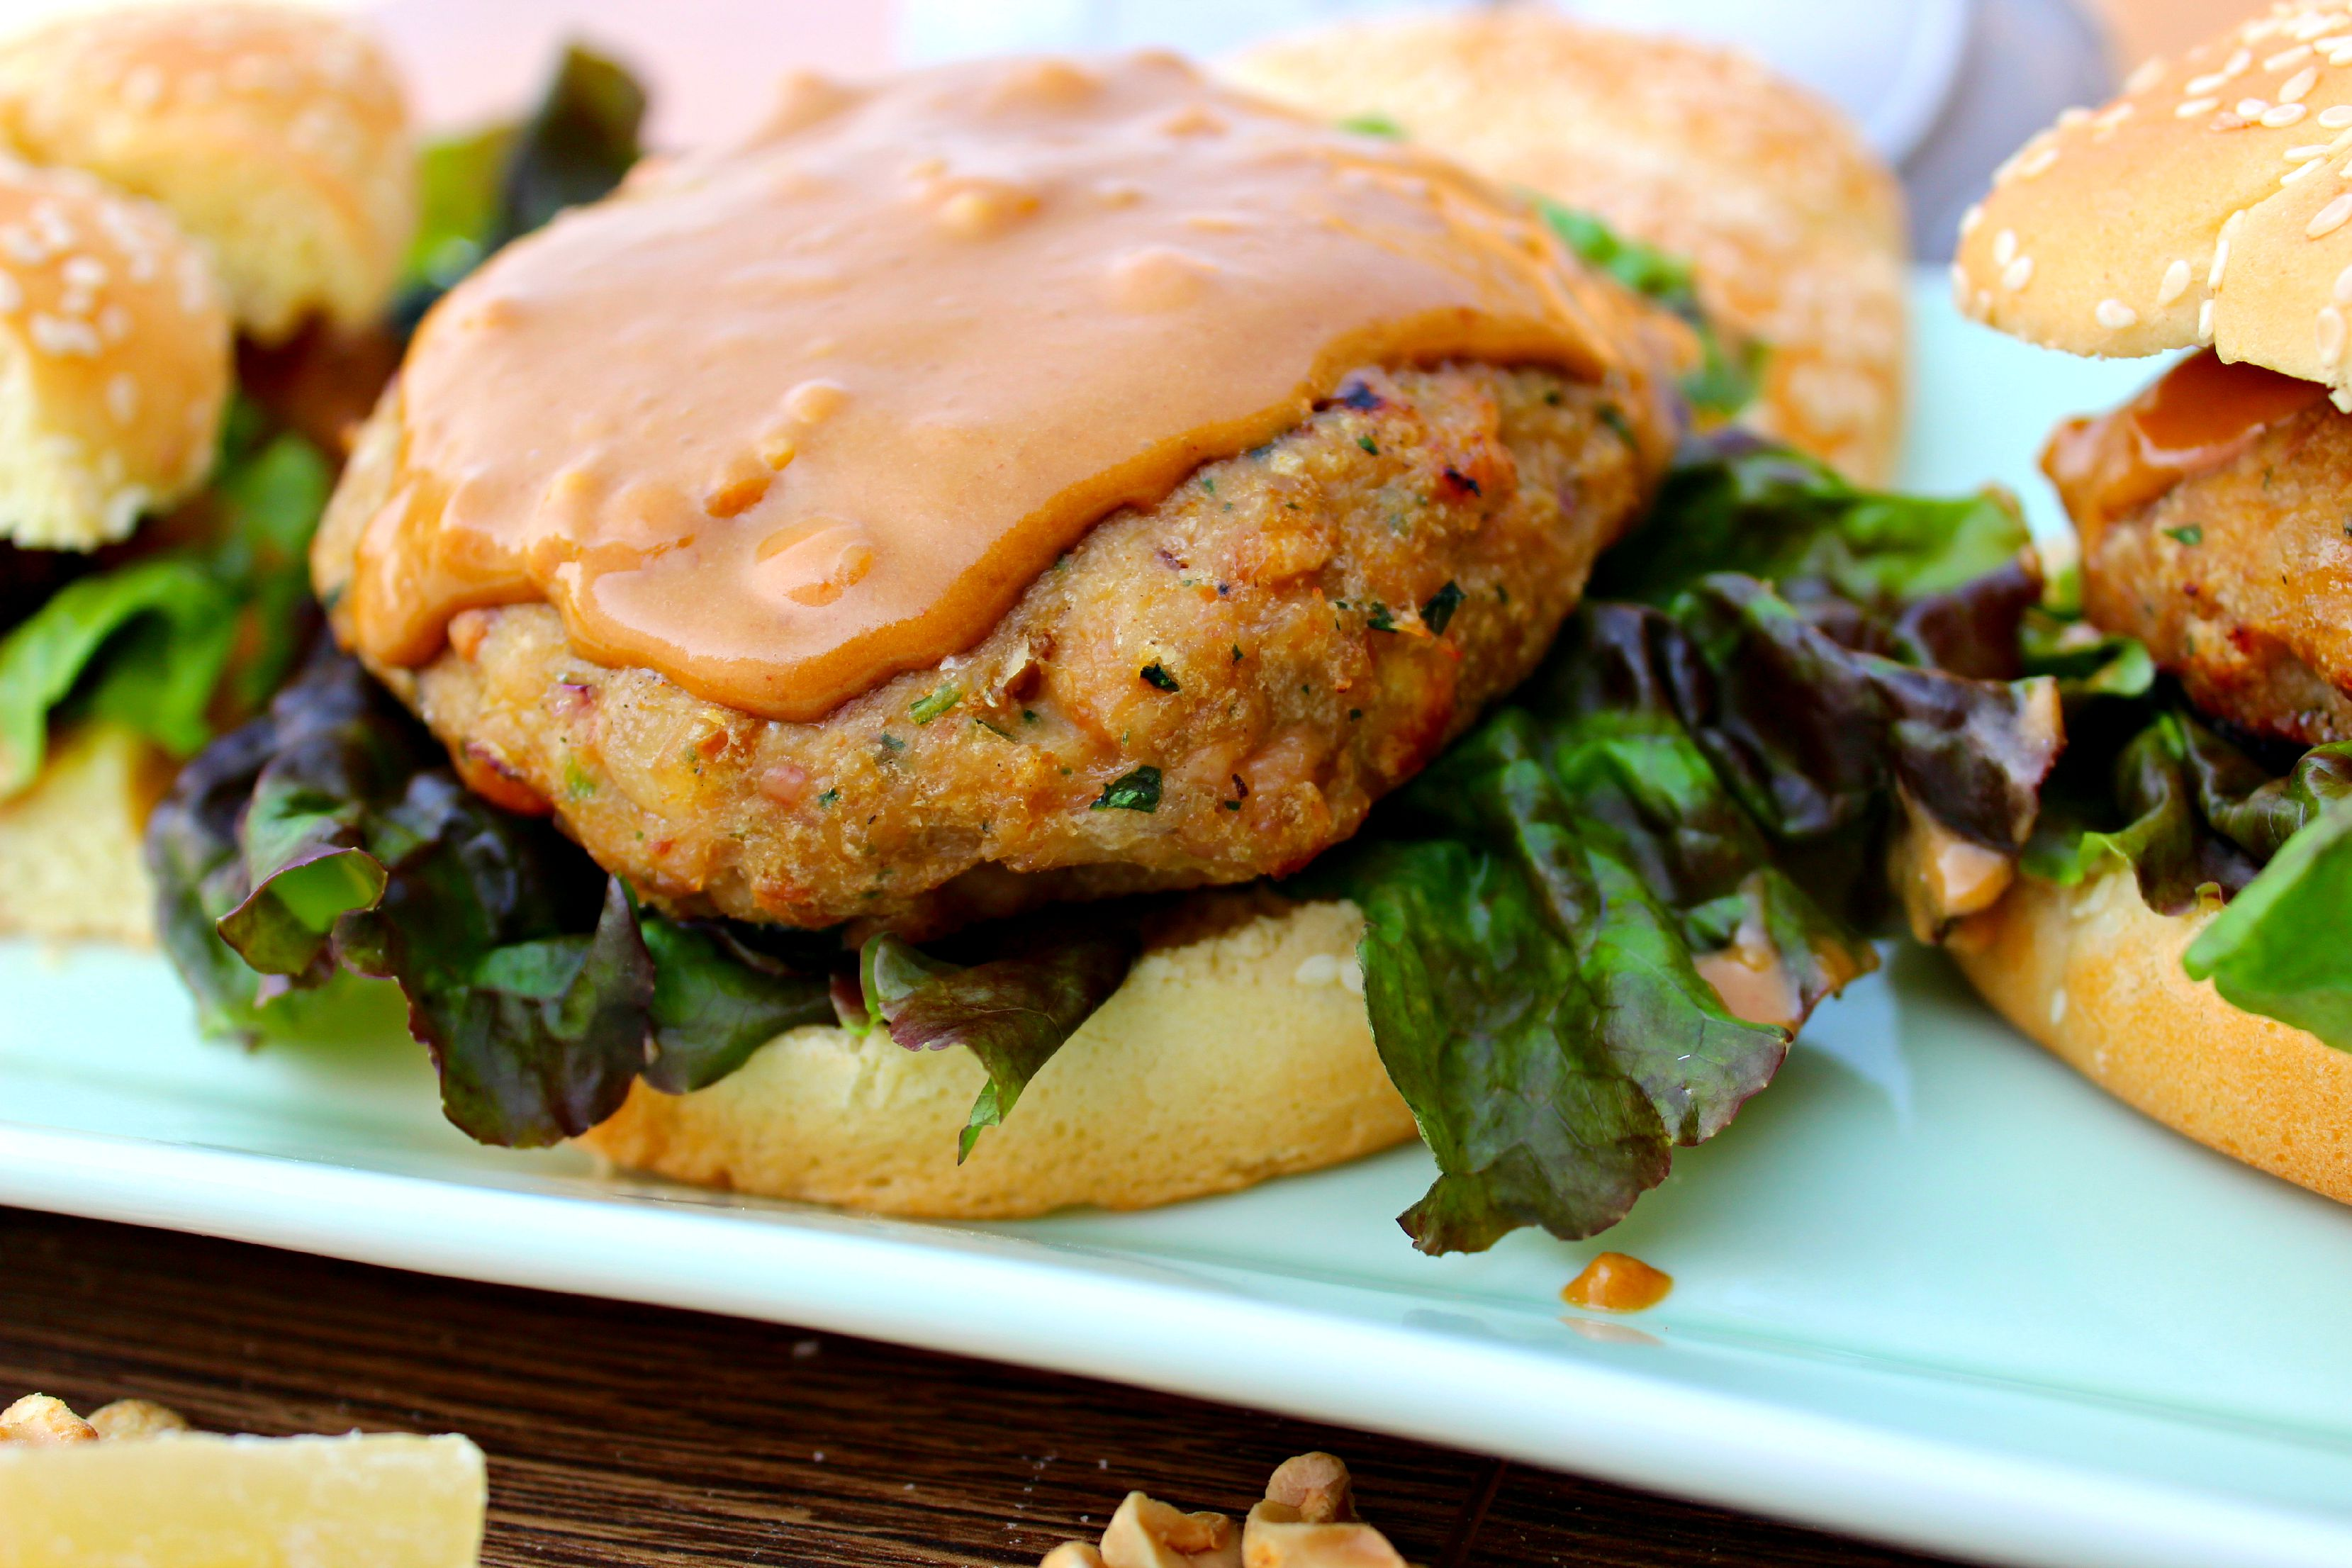 ... www.thecompletesavorist.com/daily-savorings-blog/chicken-satay-burgers